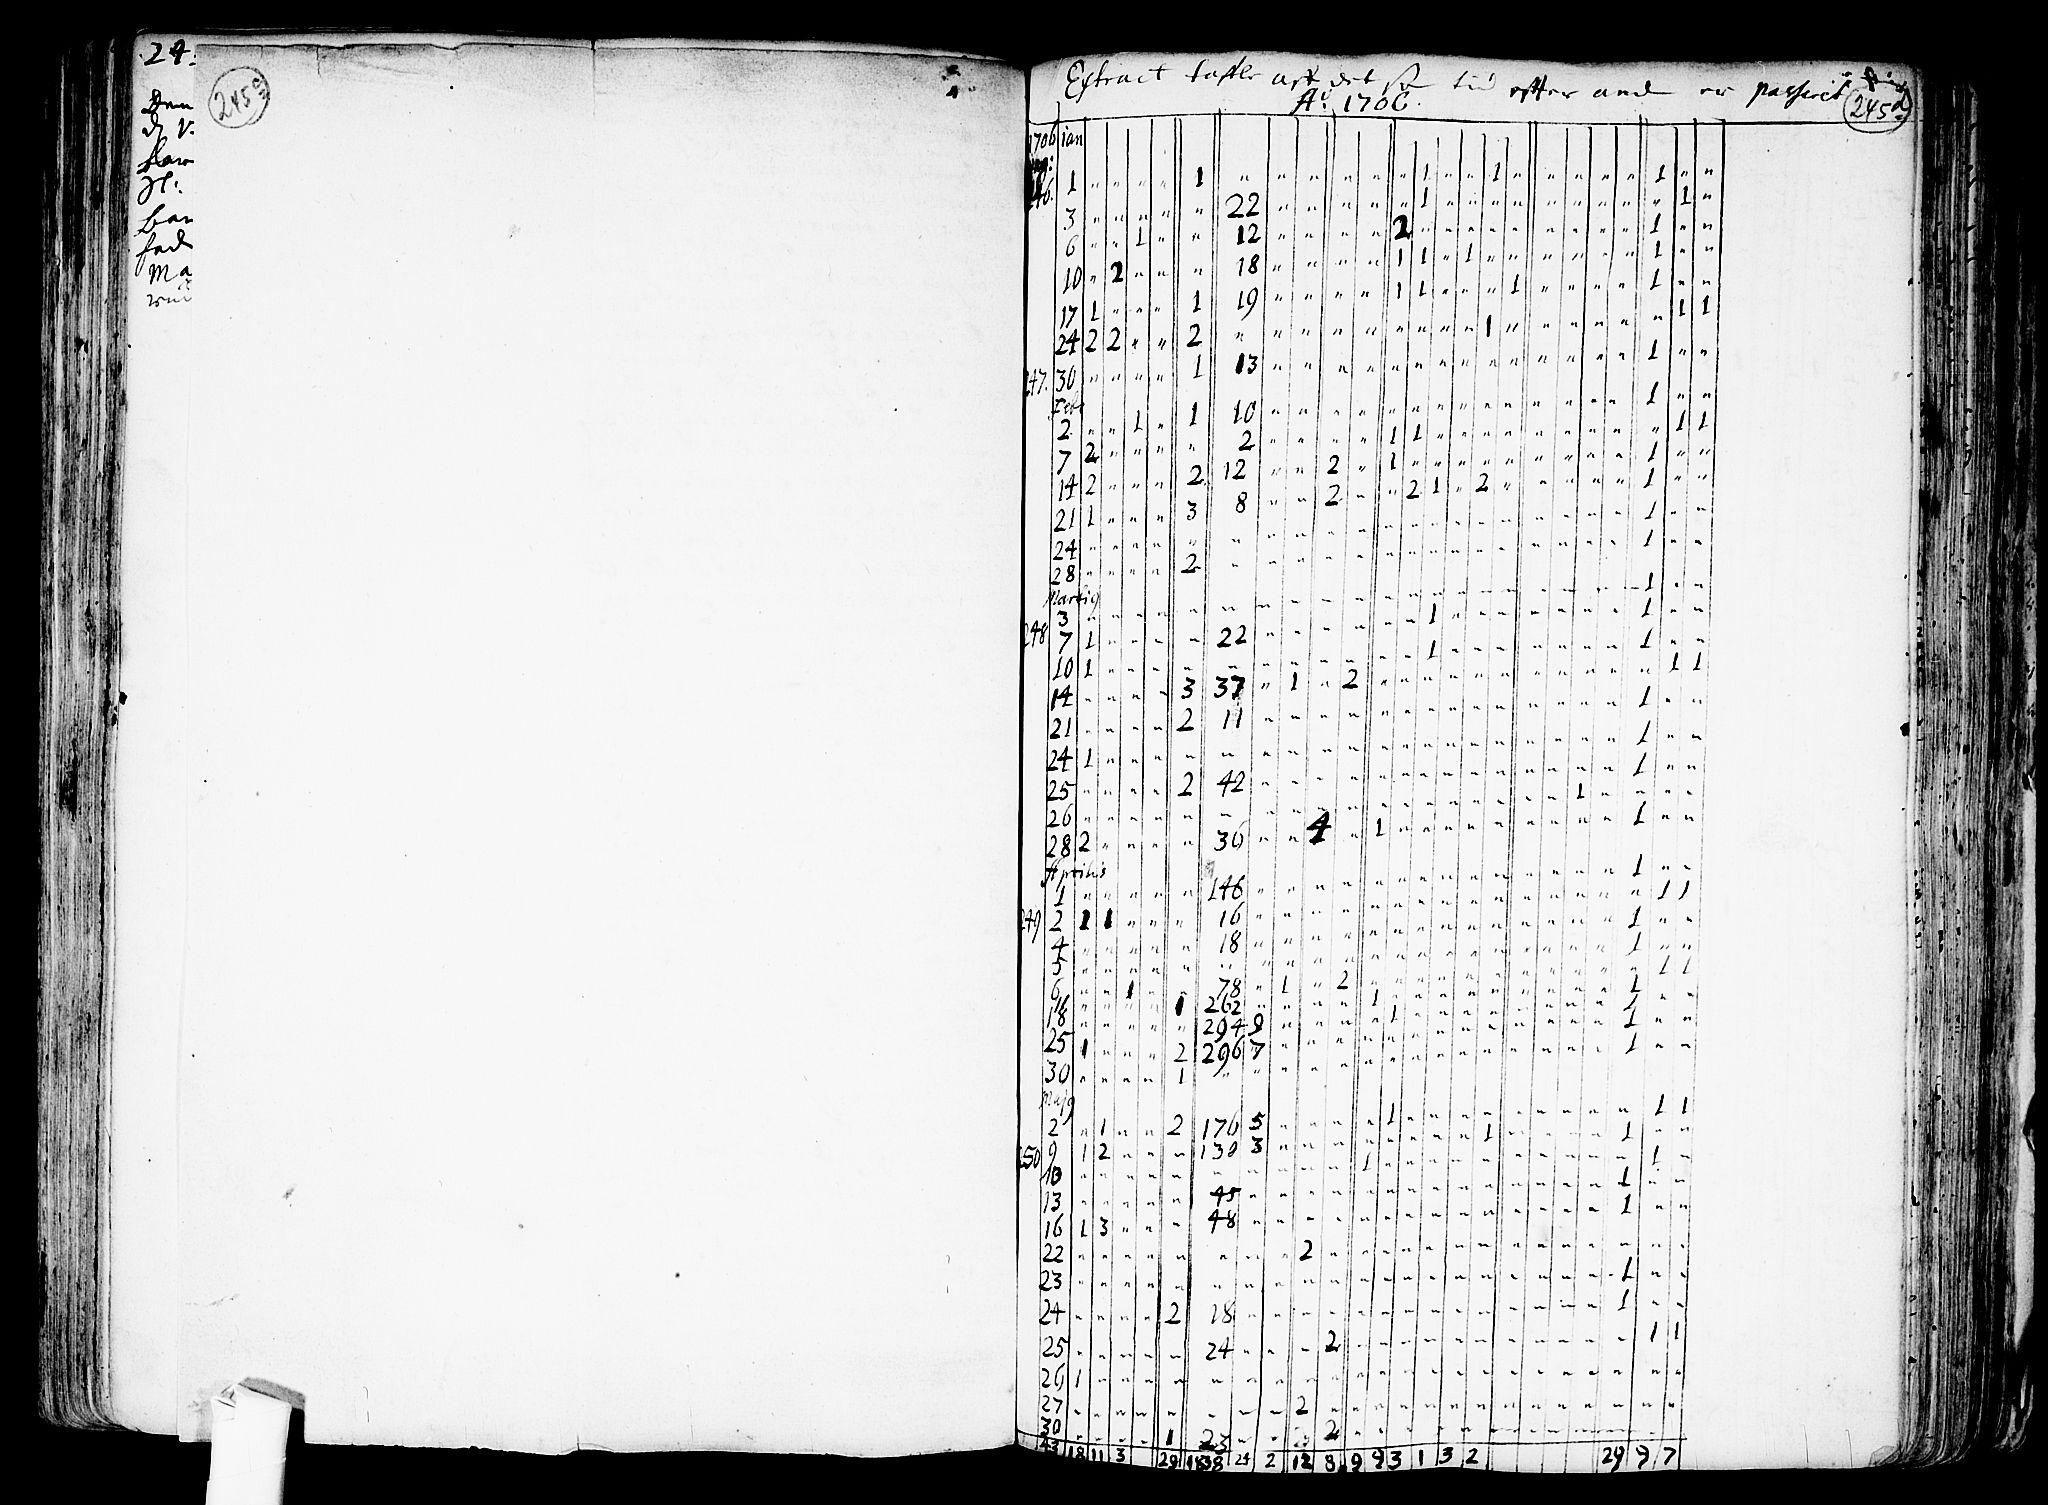 SAO, Nes prestekontor Kirkebøker, F/Fa/L0001: Ministerialbok nr. I 1, 1689-1716, s. 245d